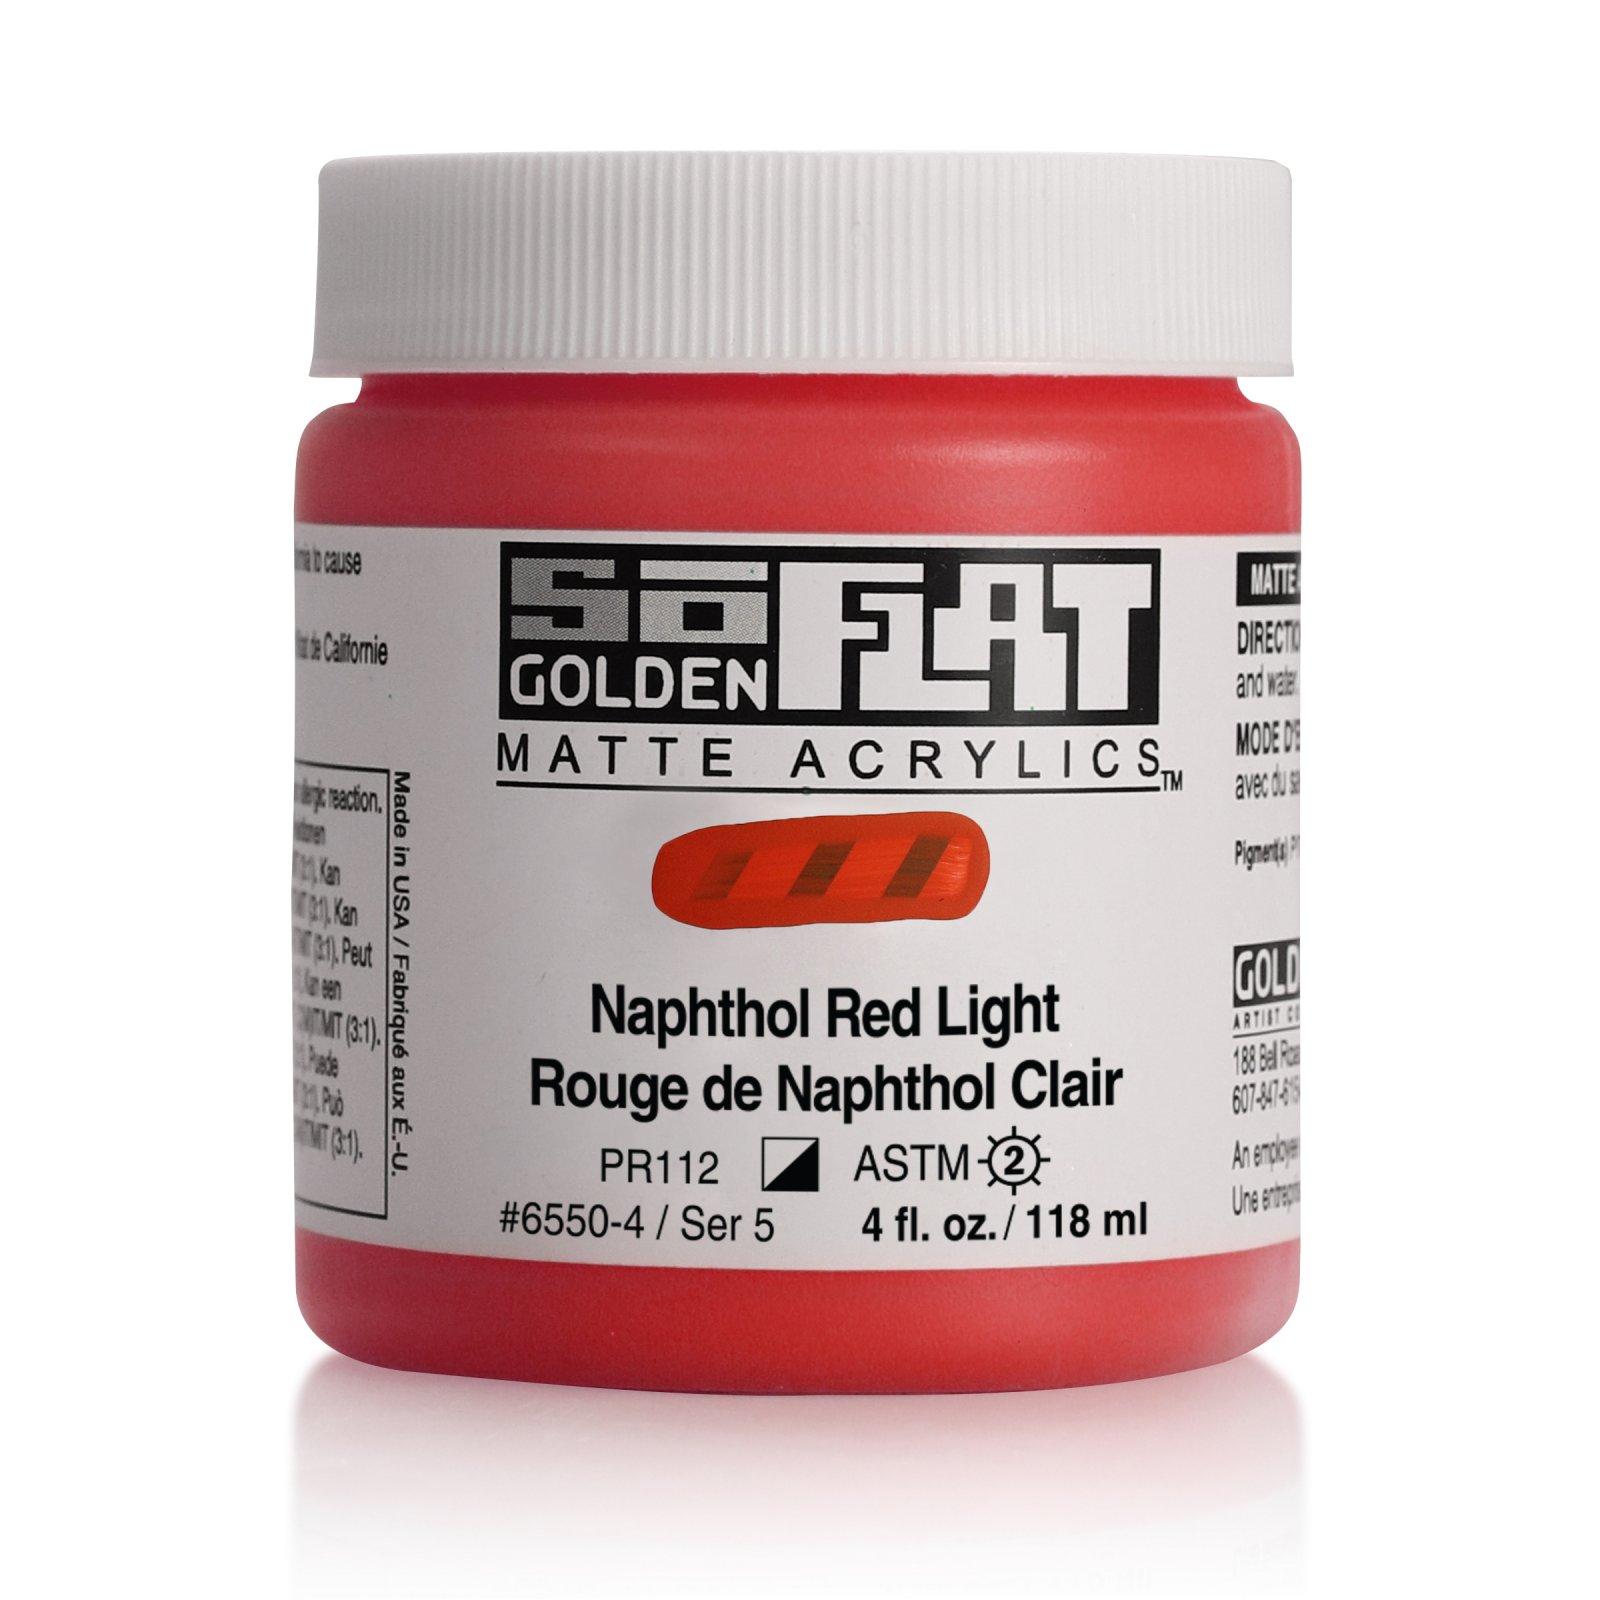 SOFLAT 4OZ NAPHTHOL RED LIGHT